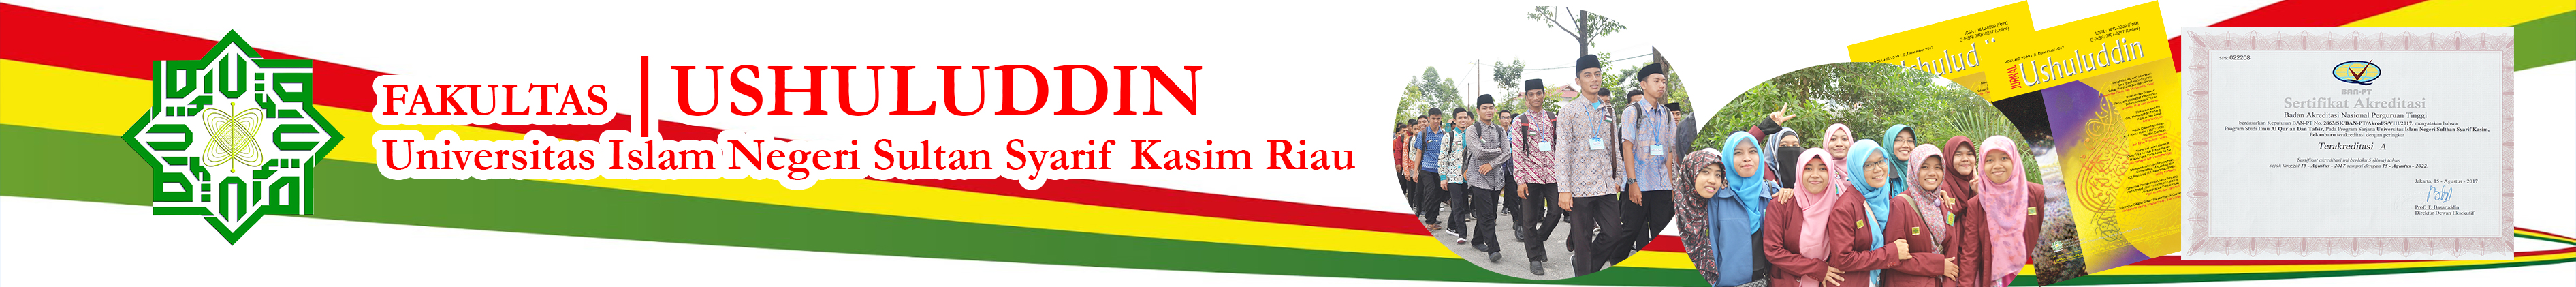 Fakultas Ushuluddin UIN Suska Riau